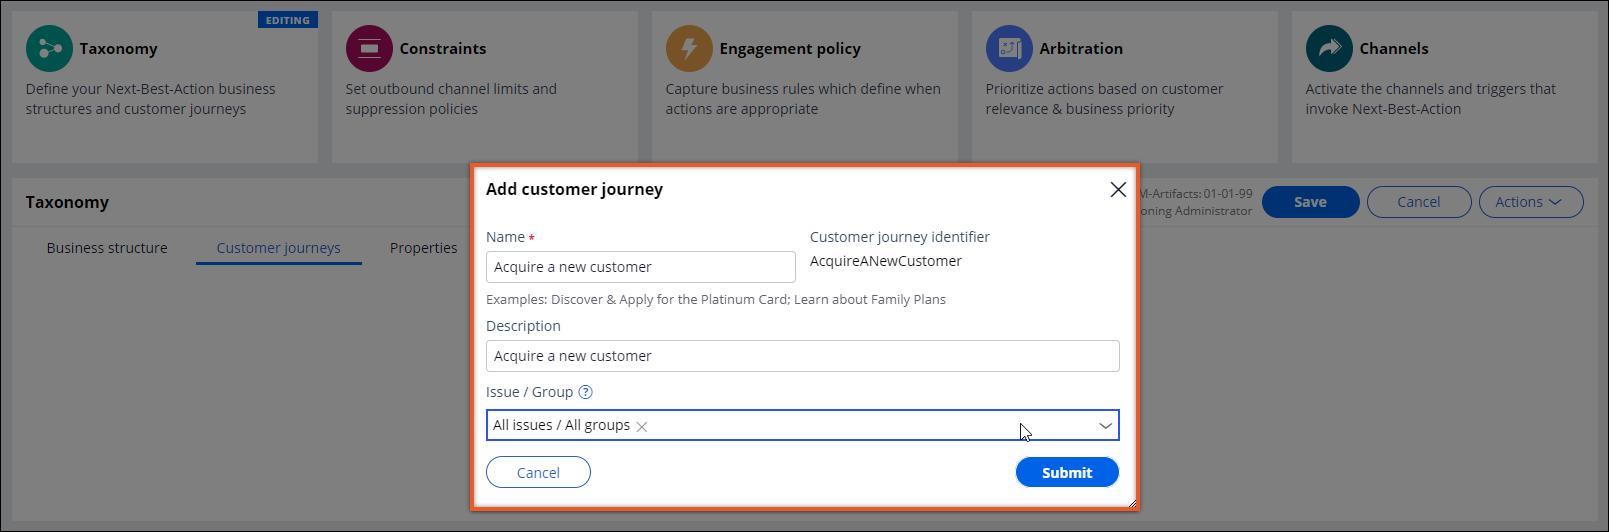 Adding a new customer journey